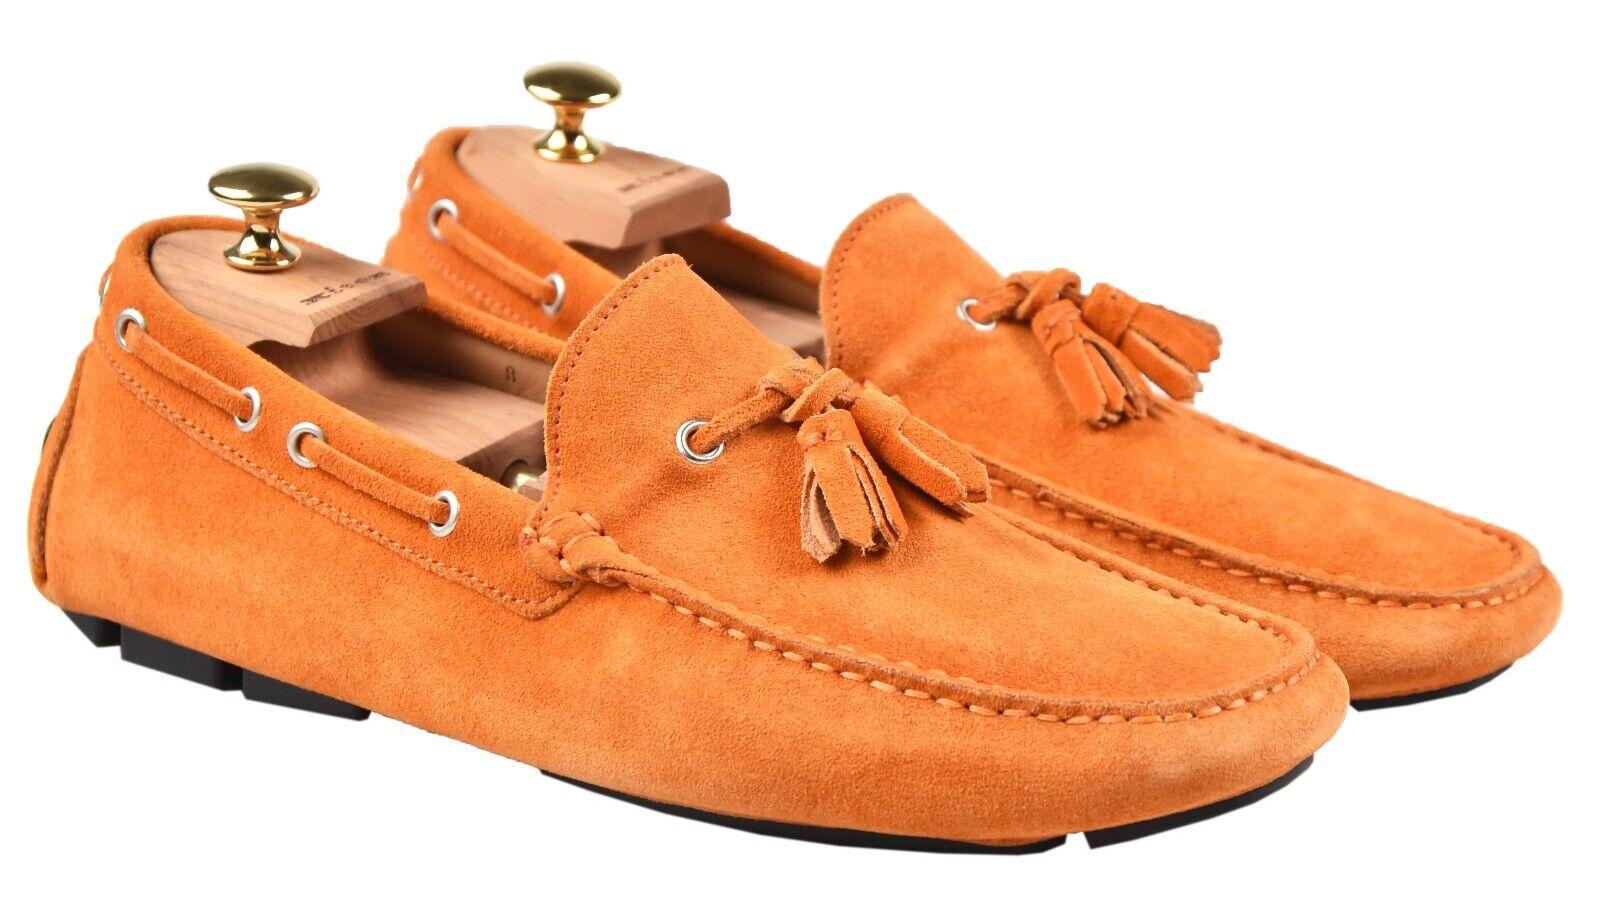 NEW KITON LOAFERS scarpe 100% LEATHER SZ 9 US 42 EU 19O129